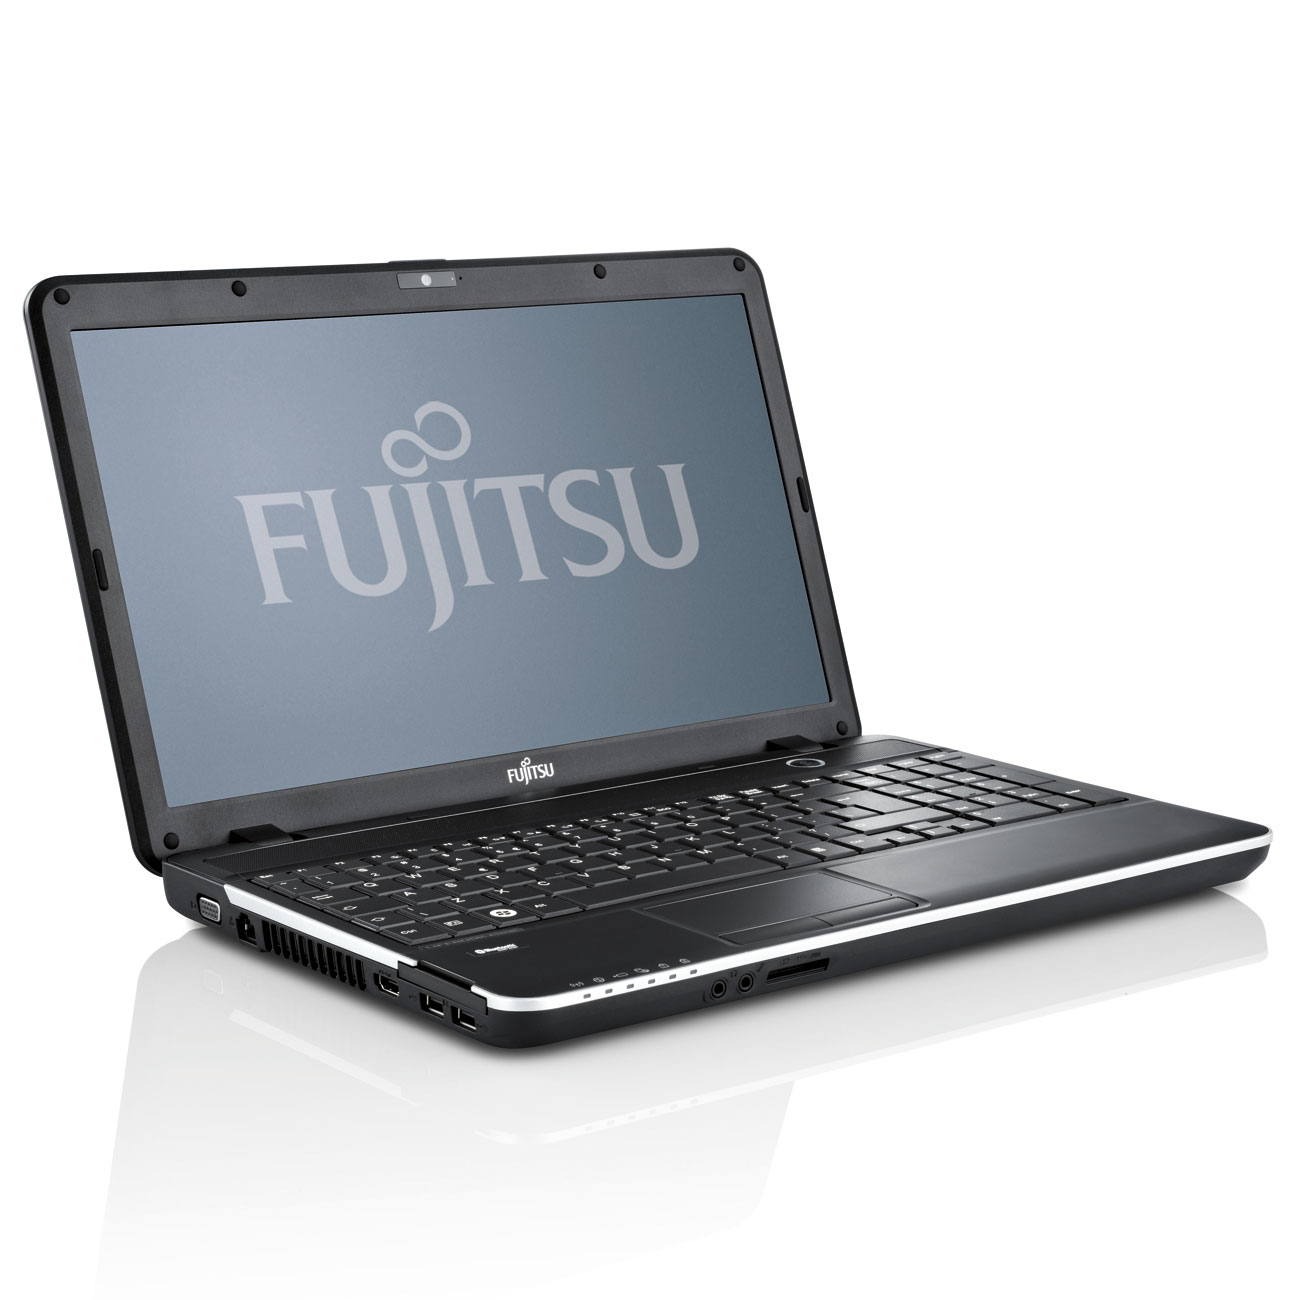 fujitsu lifebook ah512 vfy ah512m3212fr pc portable. Black Bedroom Furniture Sets. Home Design Ideas